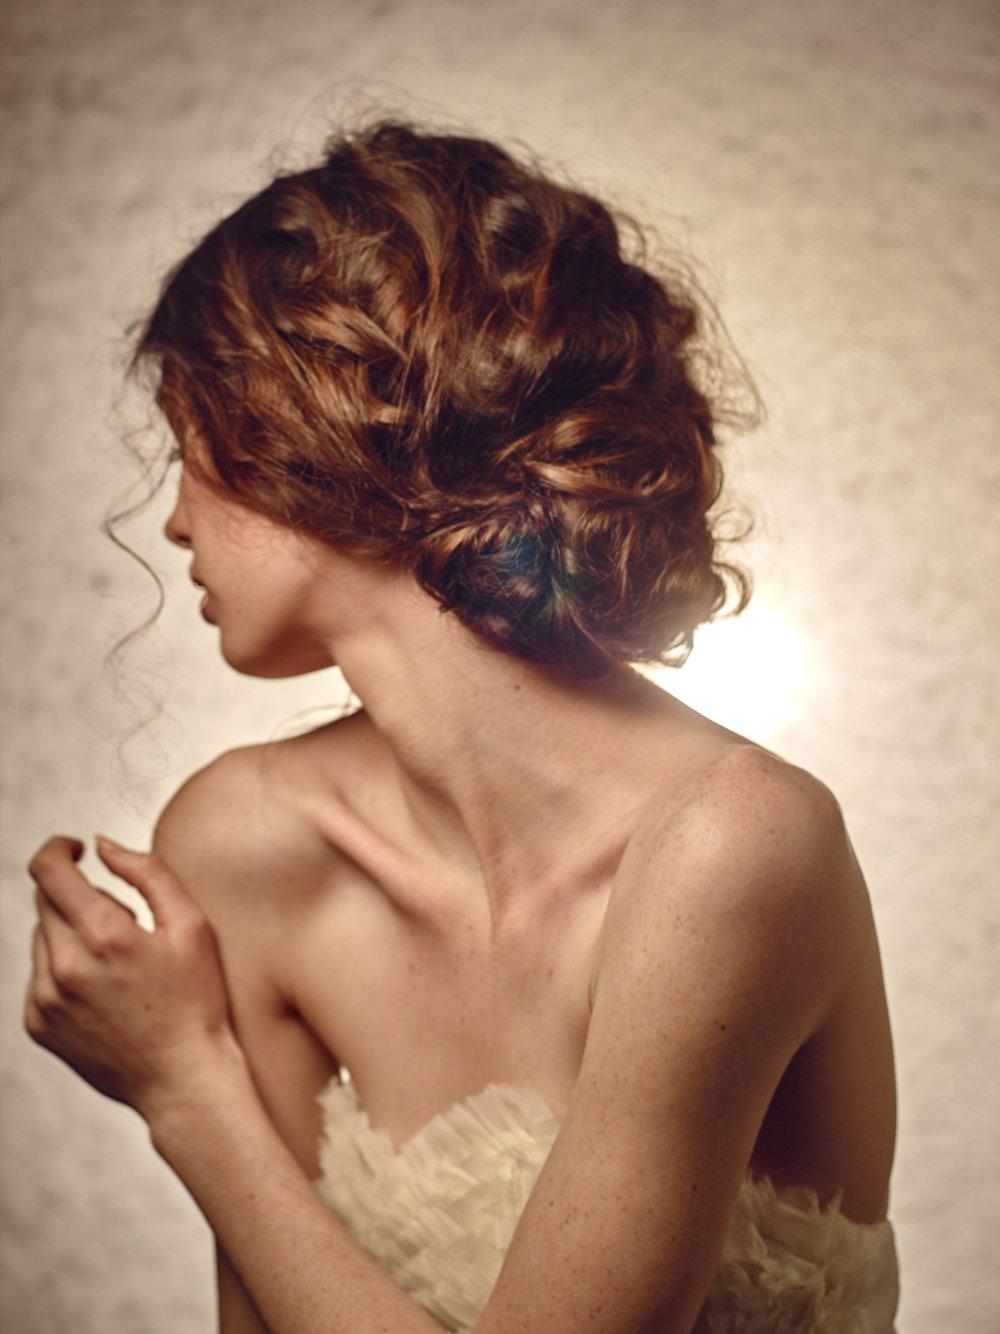 Chelsie_Hair_FINALS.jpg